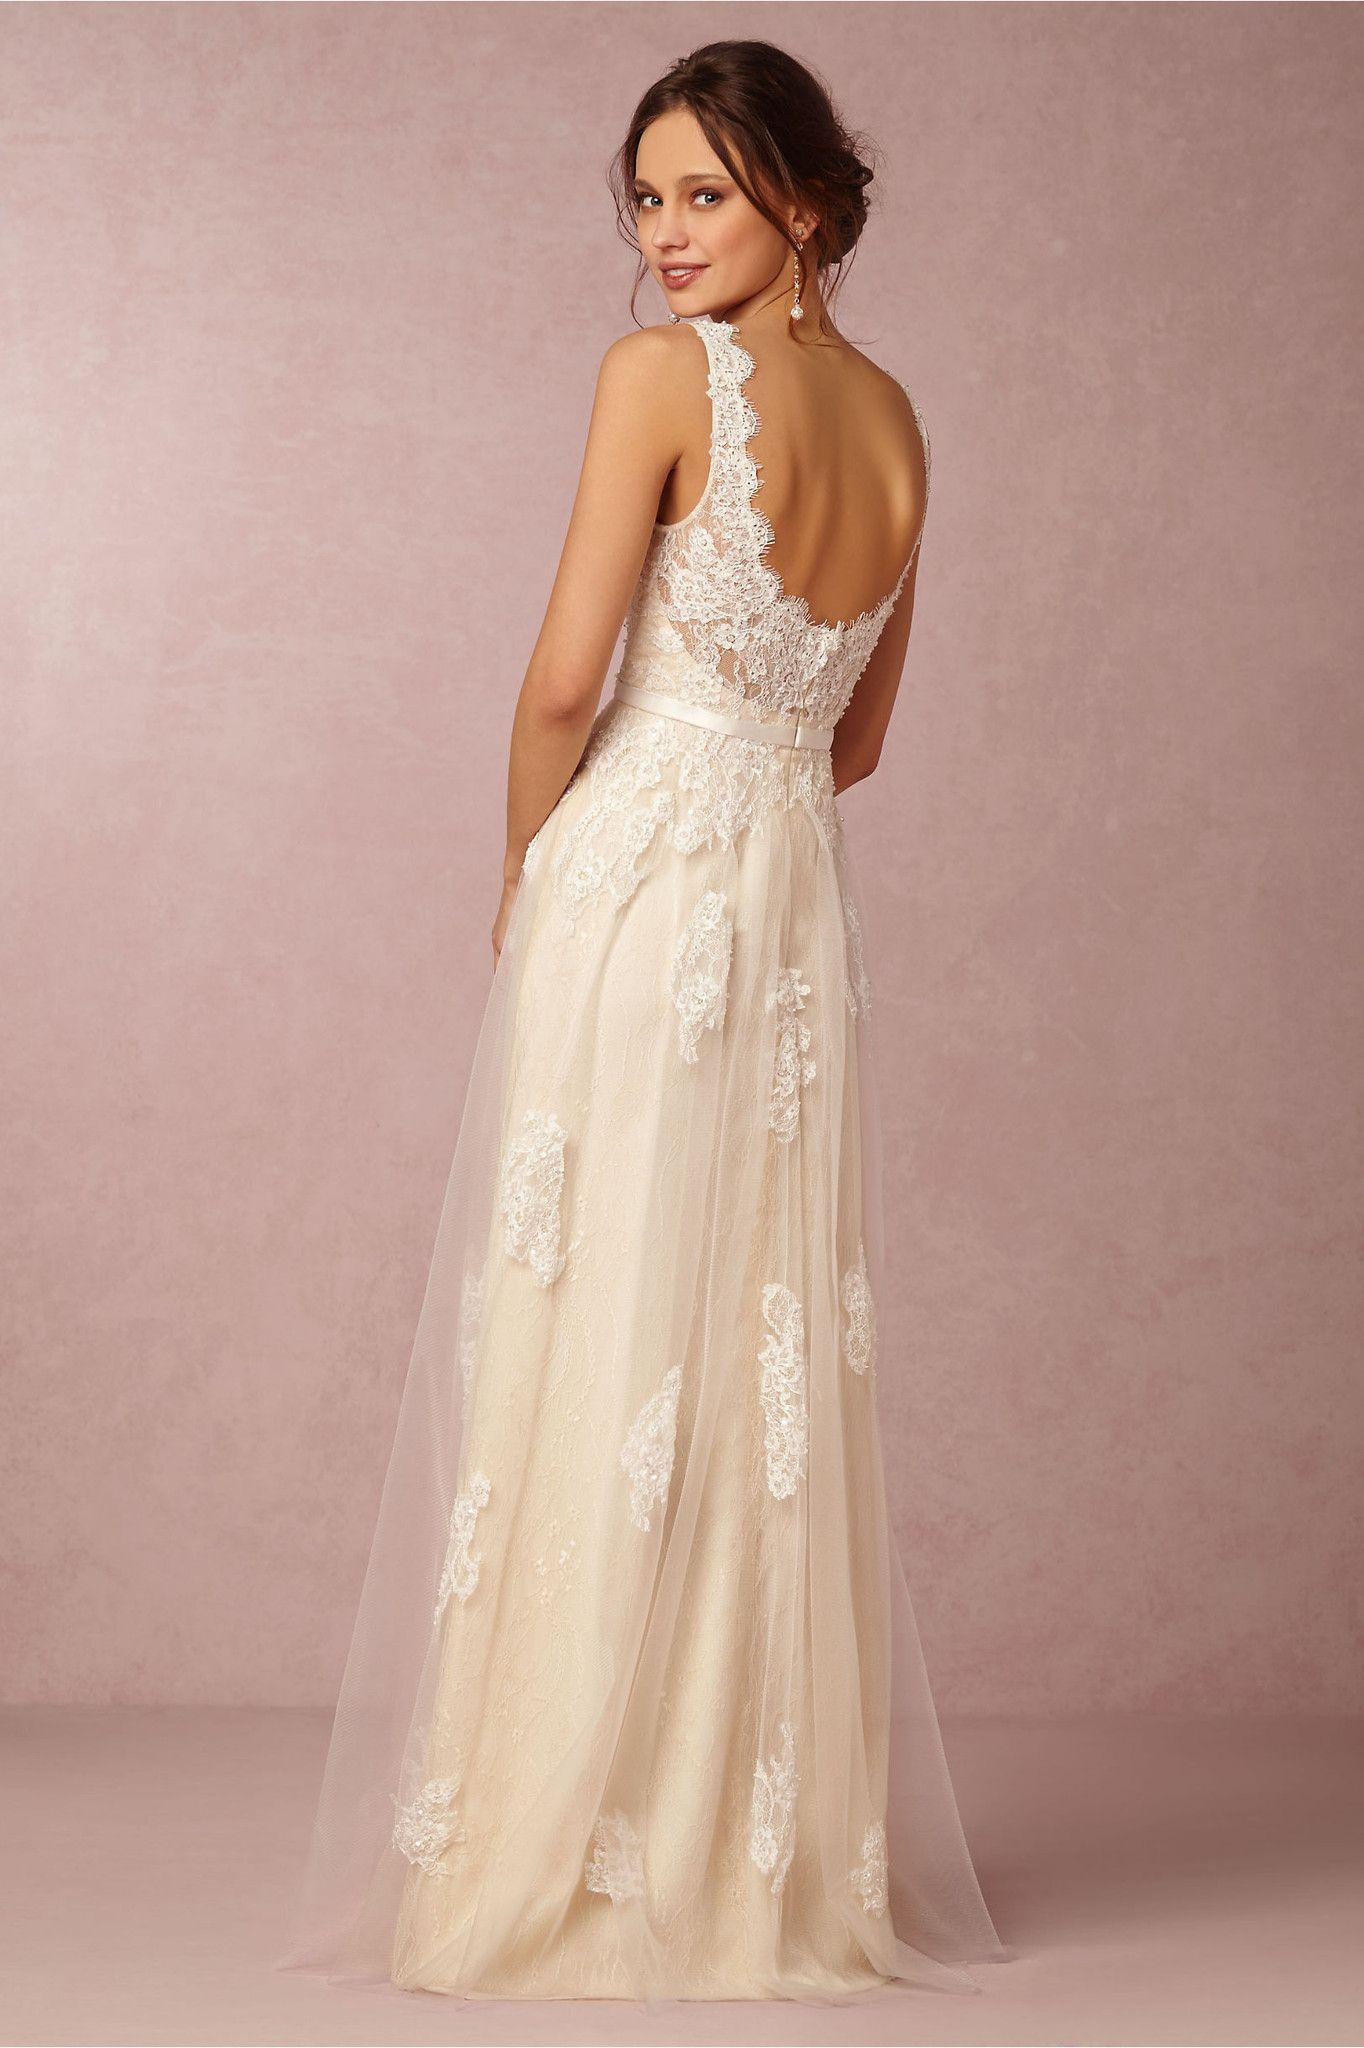 BHLDN \'Georgia\' size 10 new wedding dress - Nearly Newlywed | Ever ...